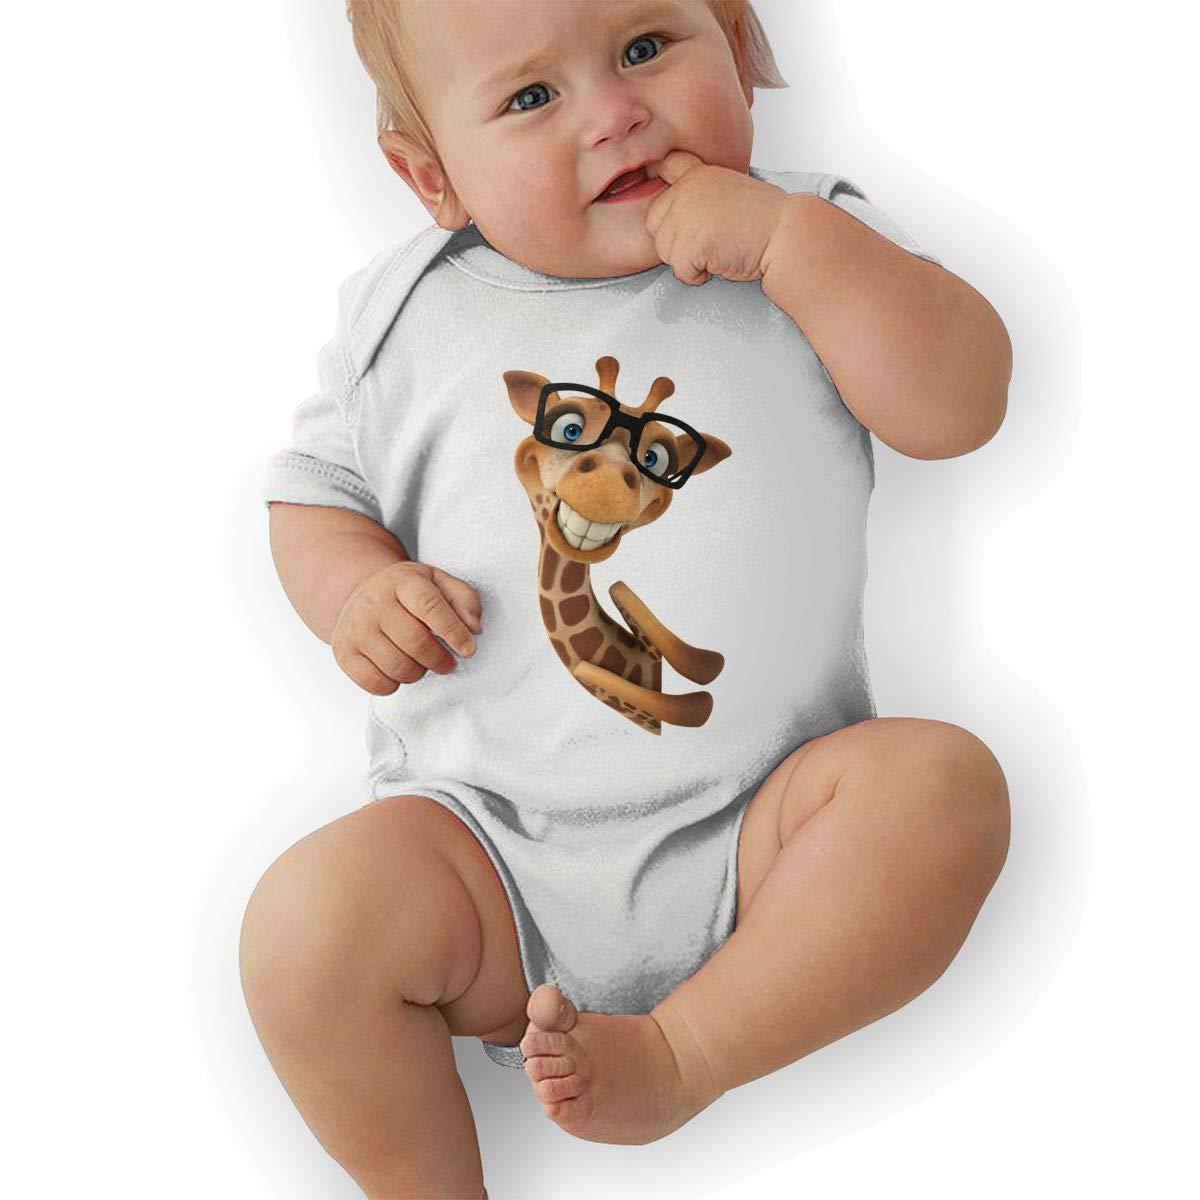 Toddler Baby Boys Bodysuit Short-Sleeve Onesie Giraffe Cute Photo Print Rompers Summer Pajamas